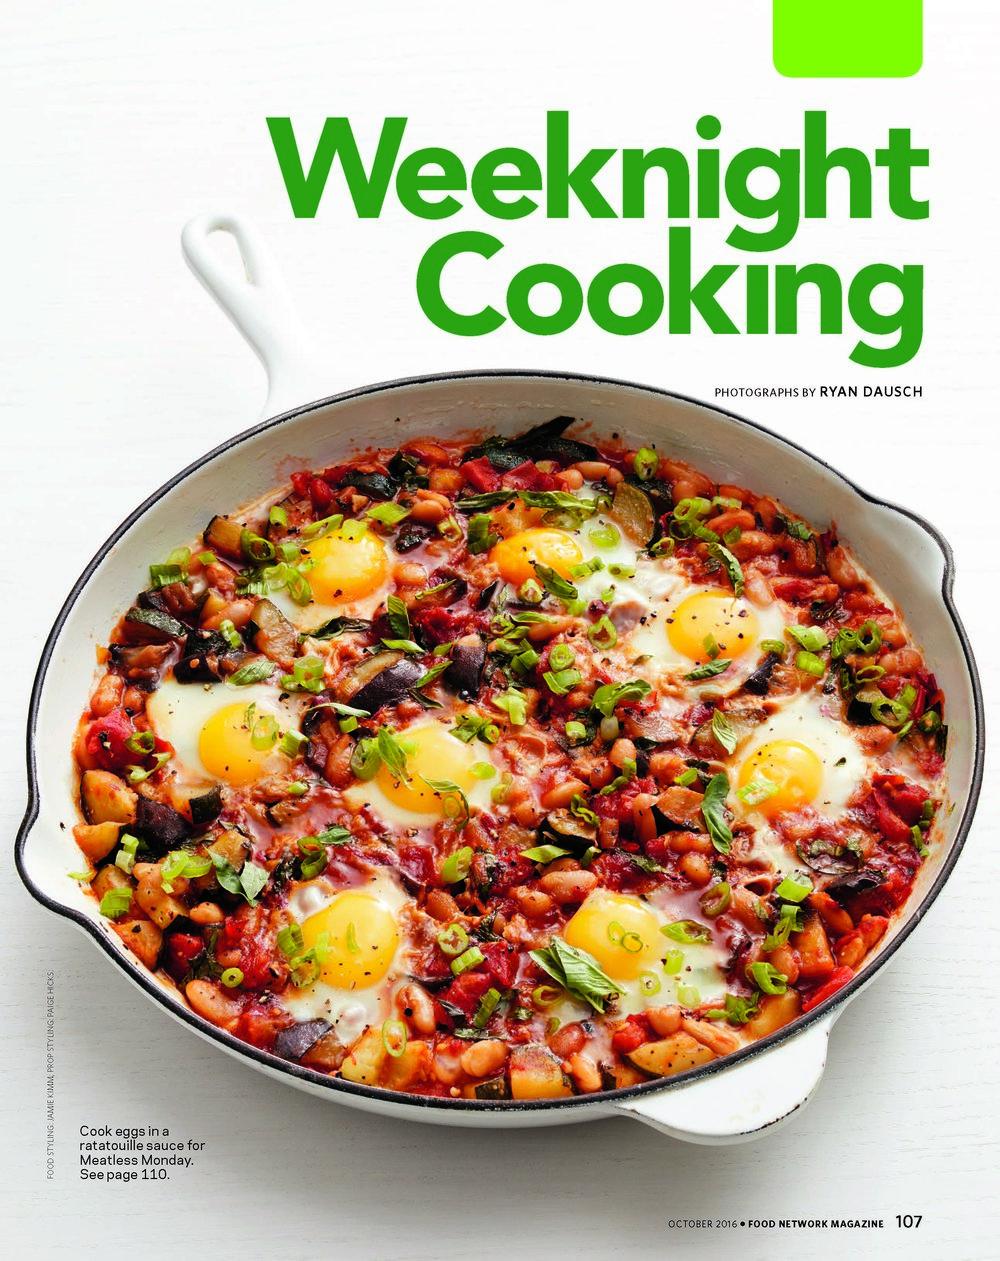 Copyright © 2016 Food Network Magazine